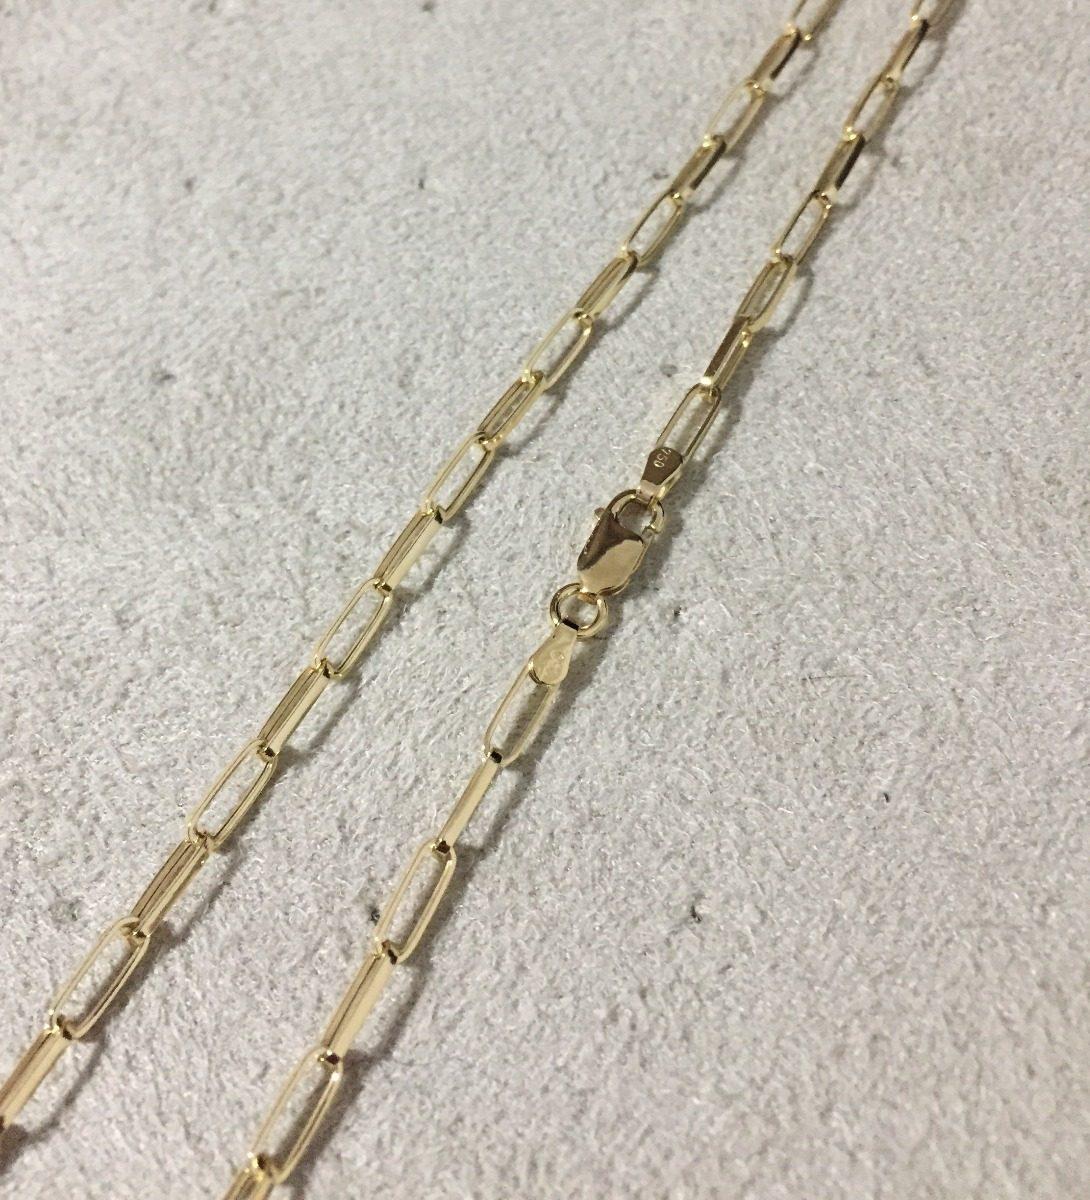 a669612543f Corrente Masculina De Ouro 18k Cart Longa 60 Cm 3mm 4